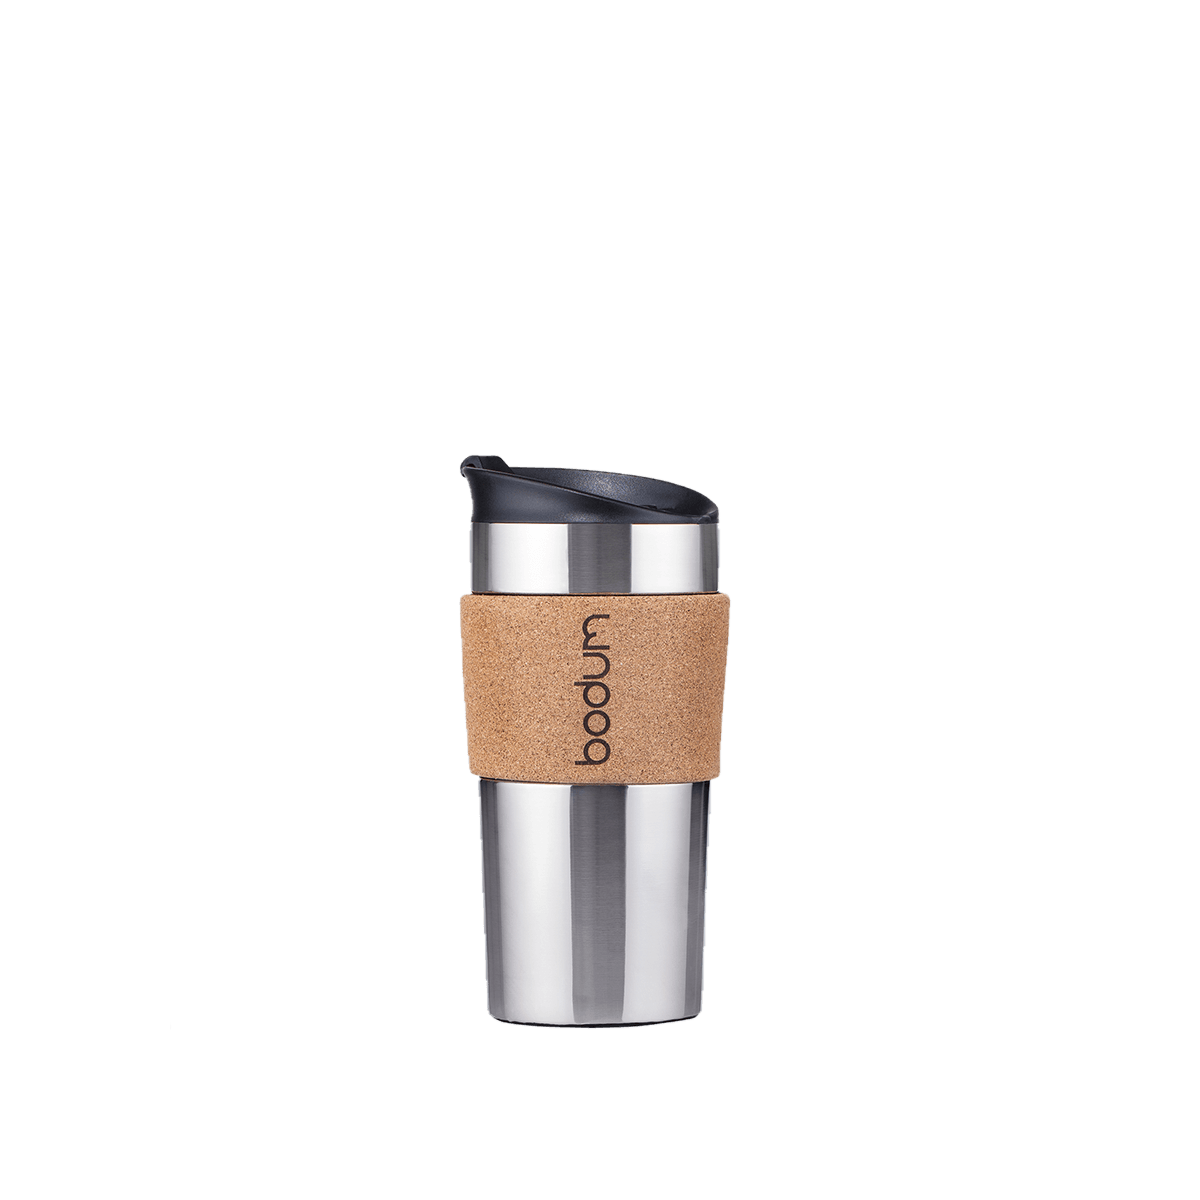 Mug de voyage isotherme double paroi: Bodum® Travel Mug – Liège